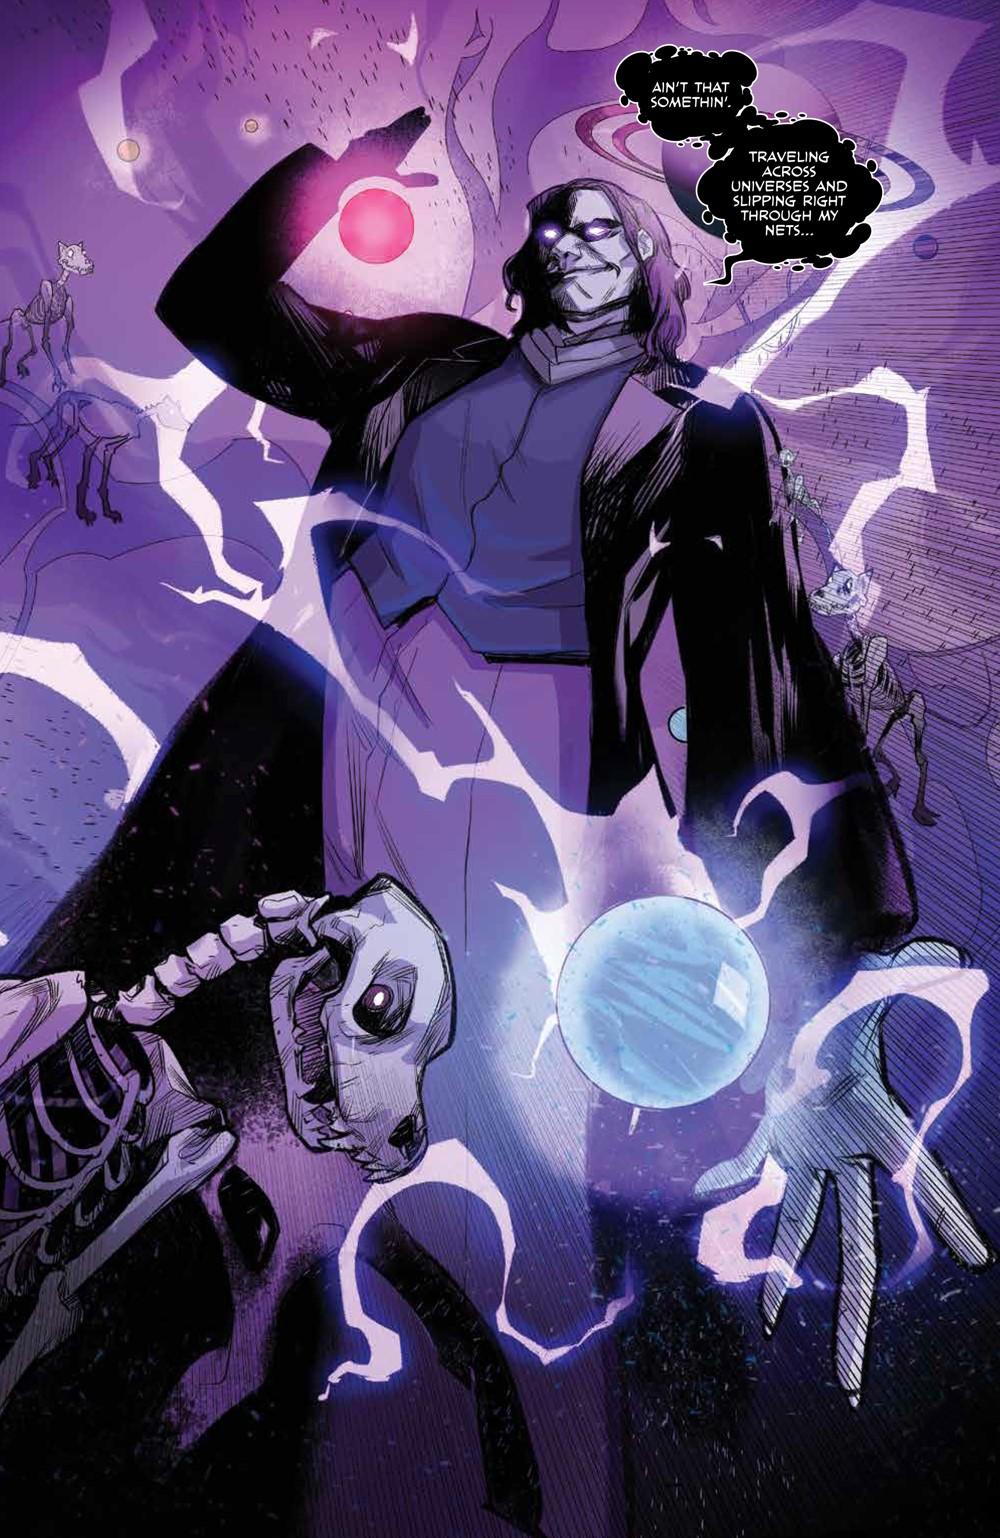 Buffy_028_PRESS_6 ComicList Previews: BUFFY THE VAMPIRE SLAYER #28